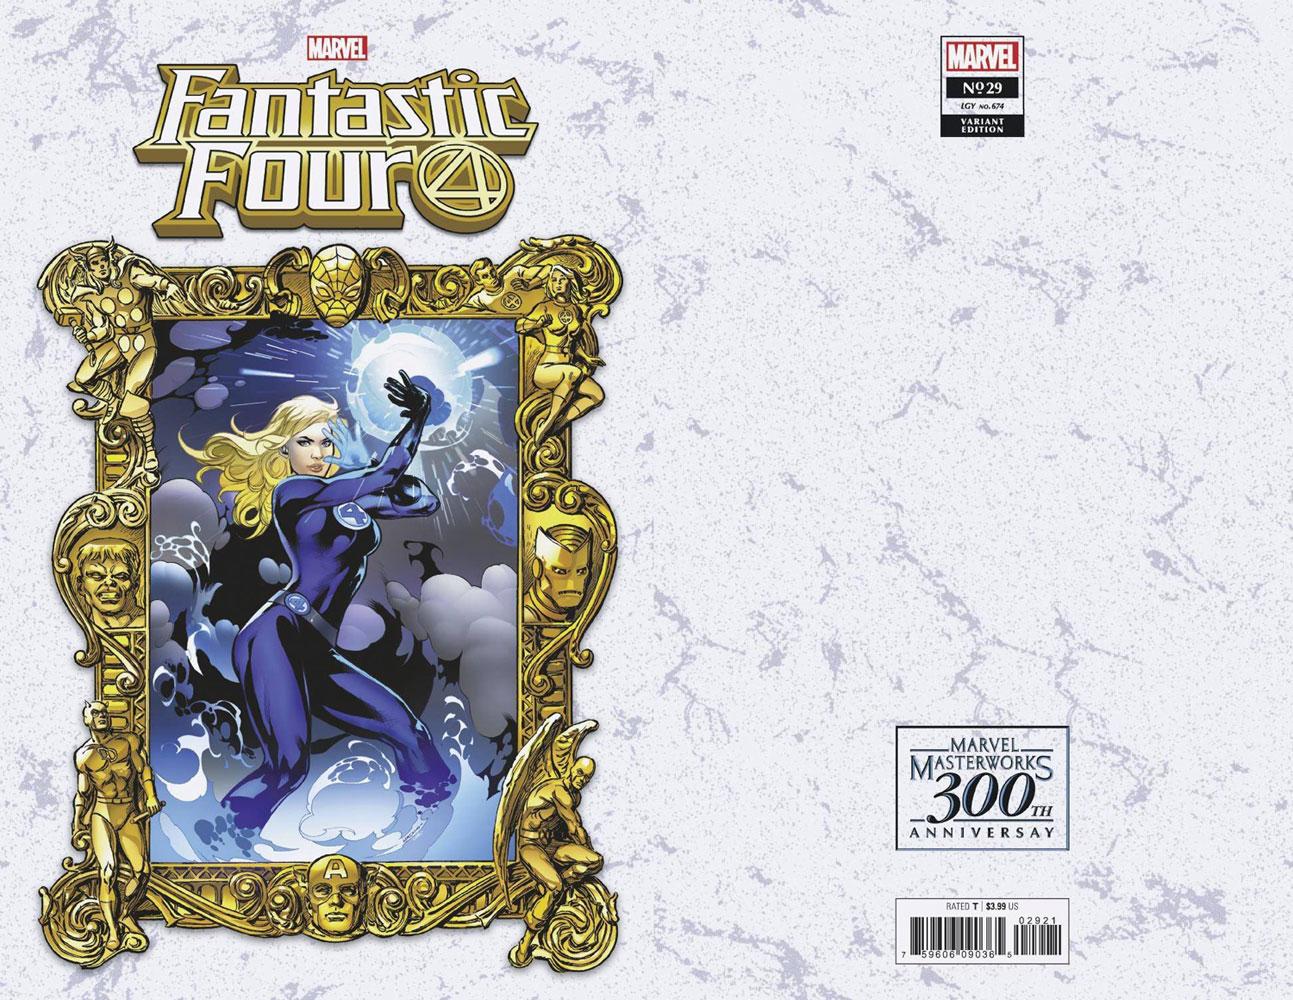 Fantastic Four #29 (KiB) (variant Masterworks cover - Lupacchino)  [2021] - Marvel Comics